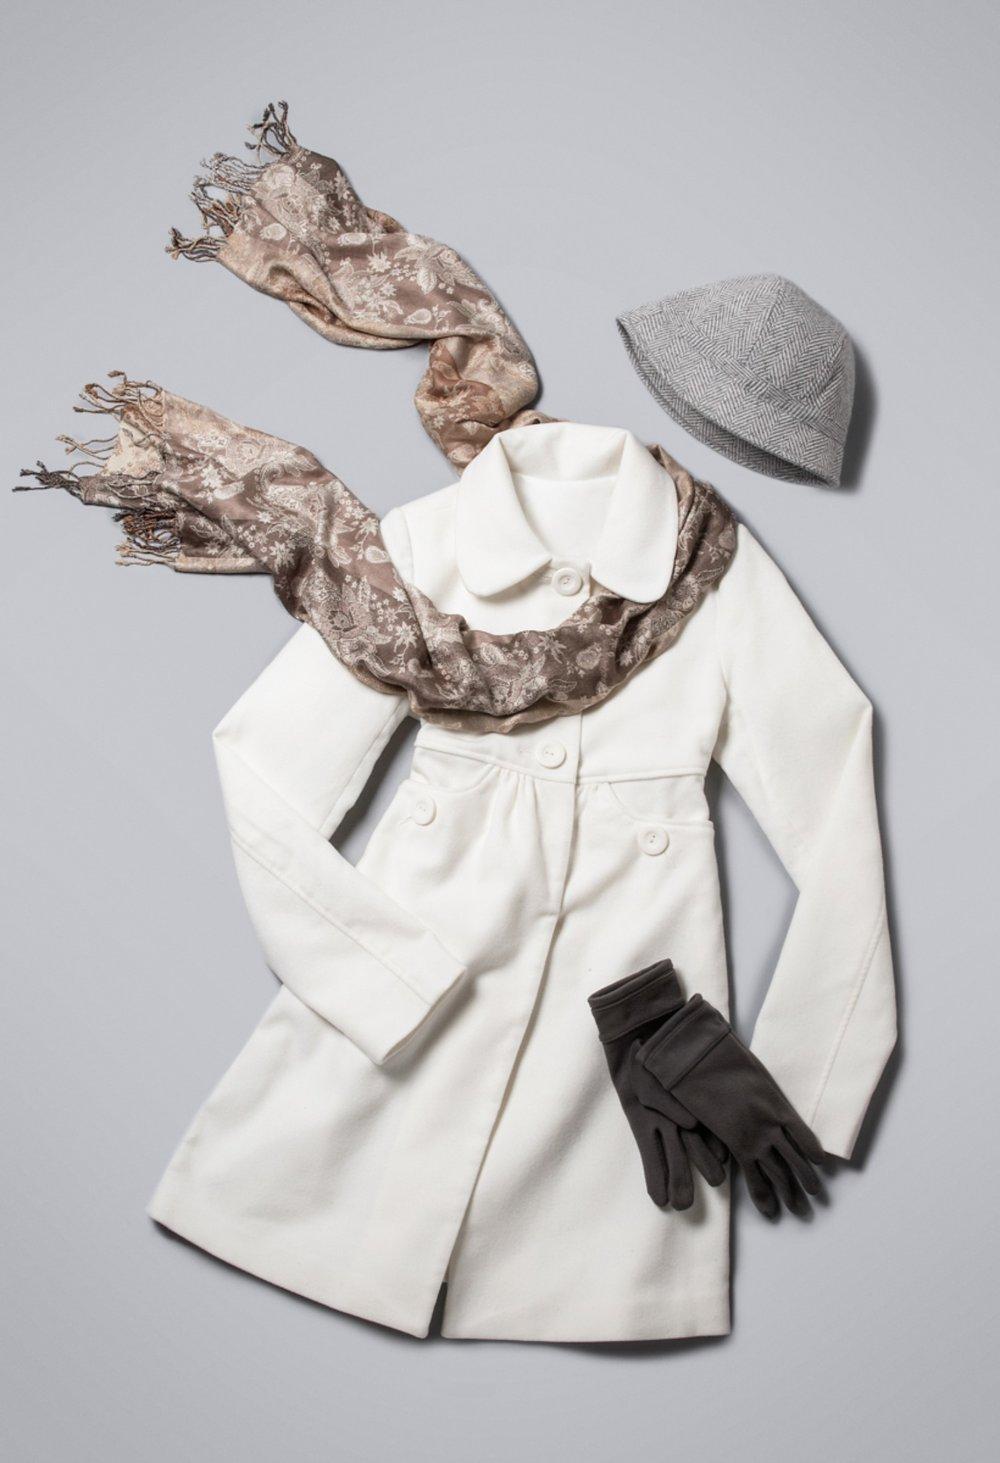 18906_clothes-029699.jpg